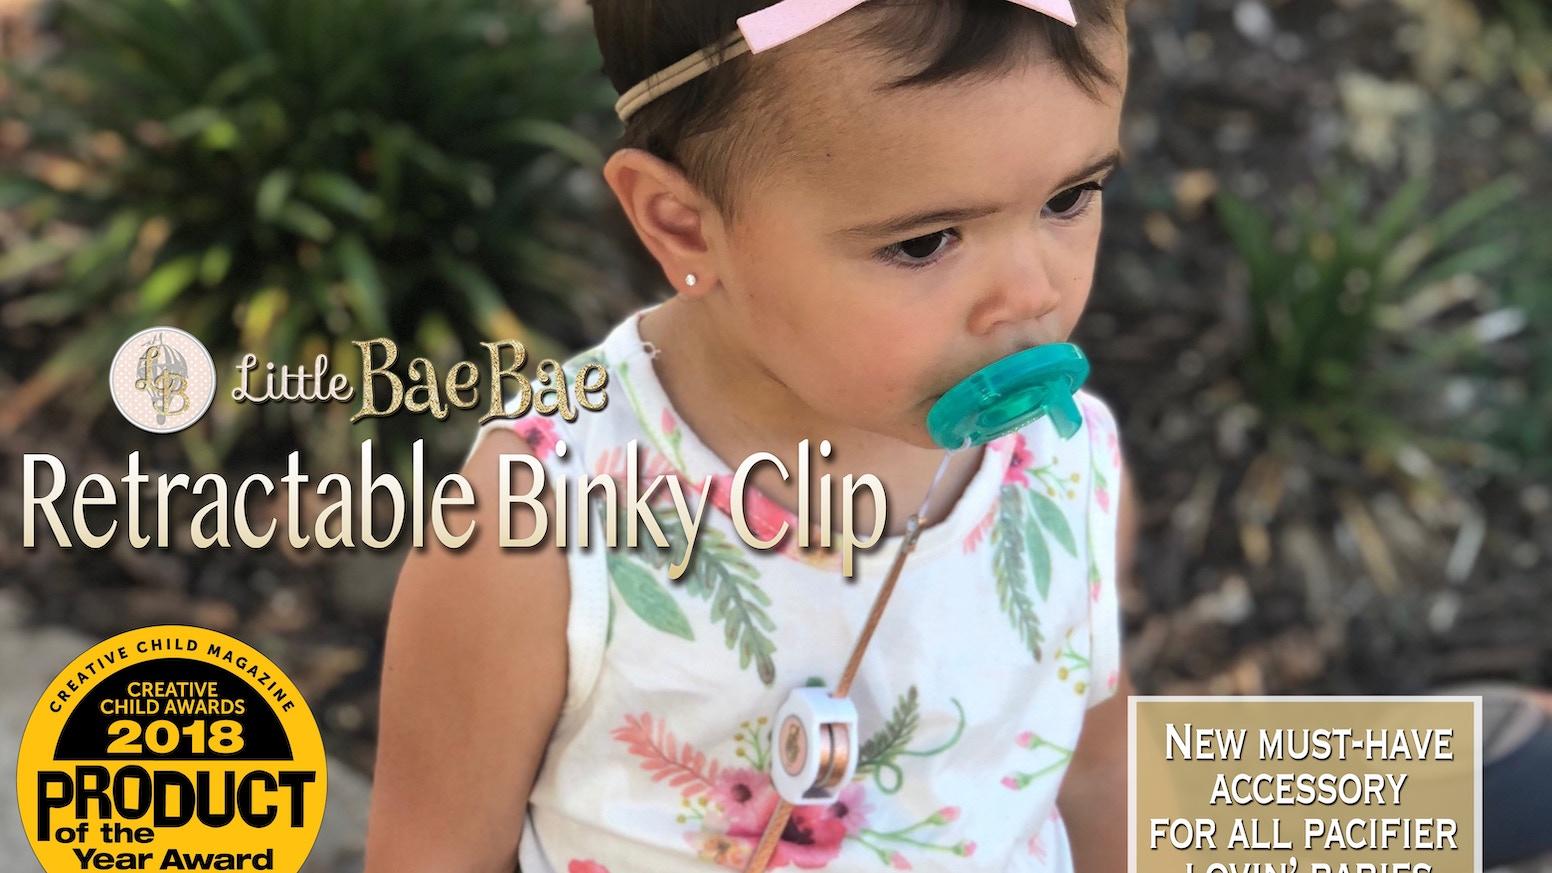 71fade4318d4 Little BaeBae Retractable Binky Clip